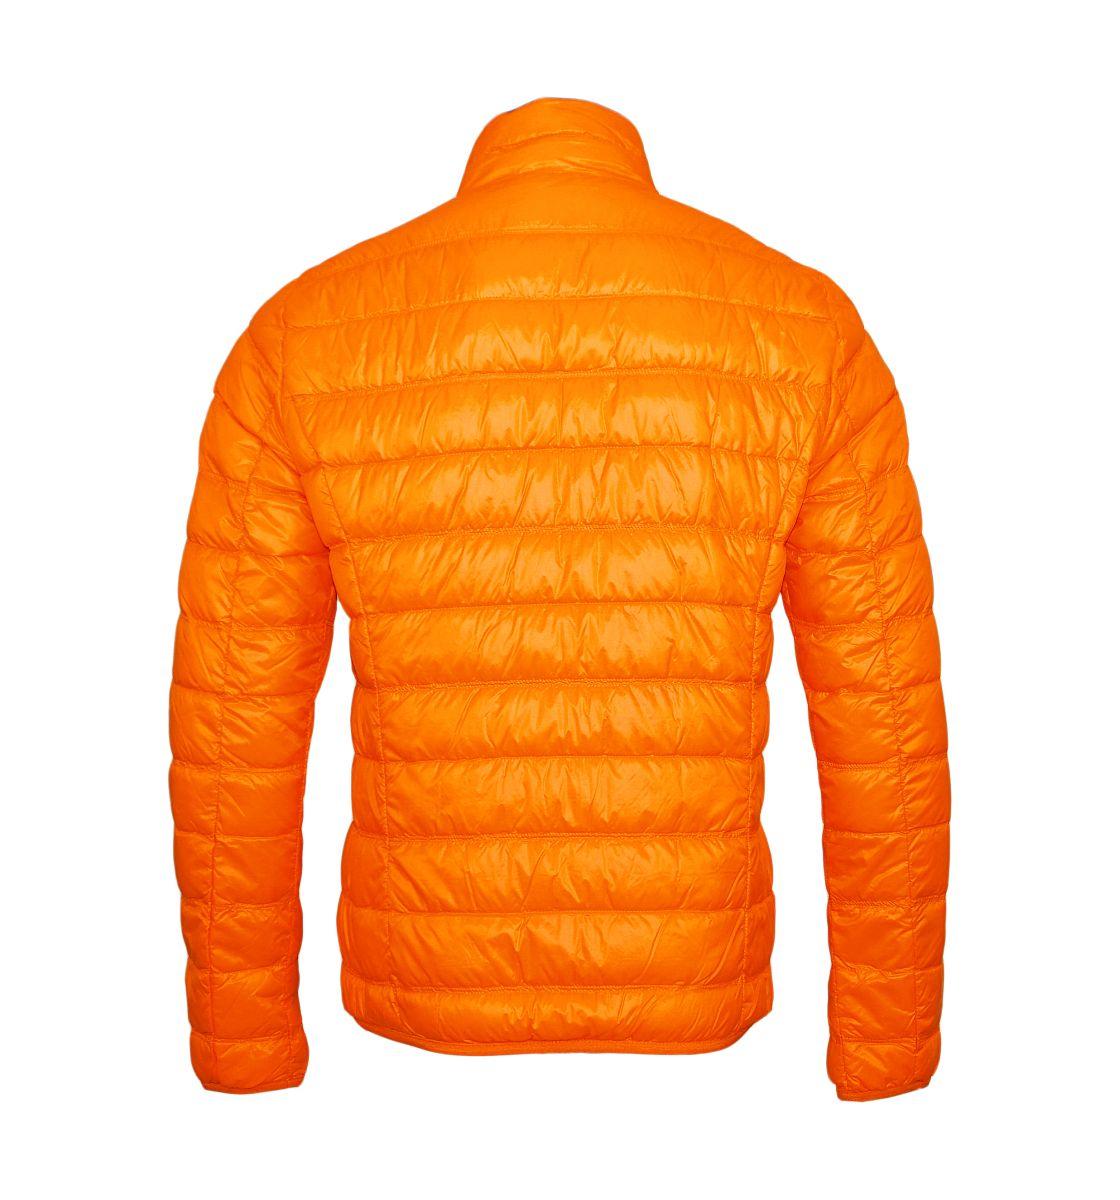 EA7 Emporio Armani Down Jacket Daunenjacke 8NPB01 PN29Z 1681 Vibrant Orange SH17-EA7J1